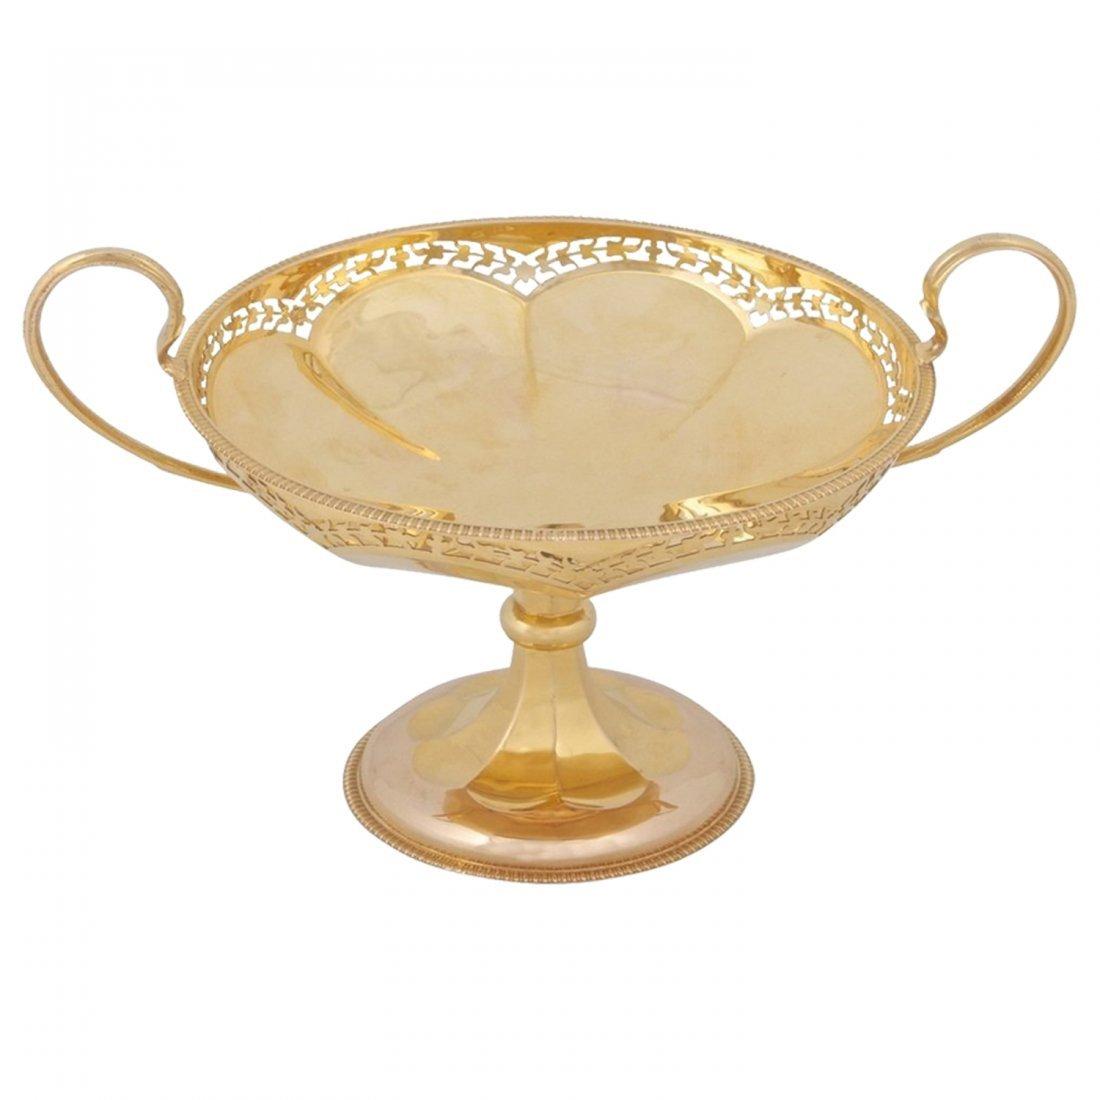 Rare Bvlgari 15K Gold Centerpiece in Custom Fitted Box